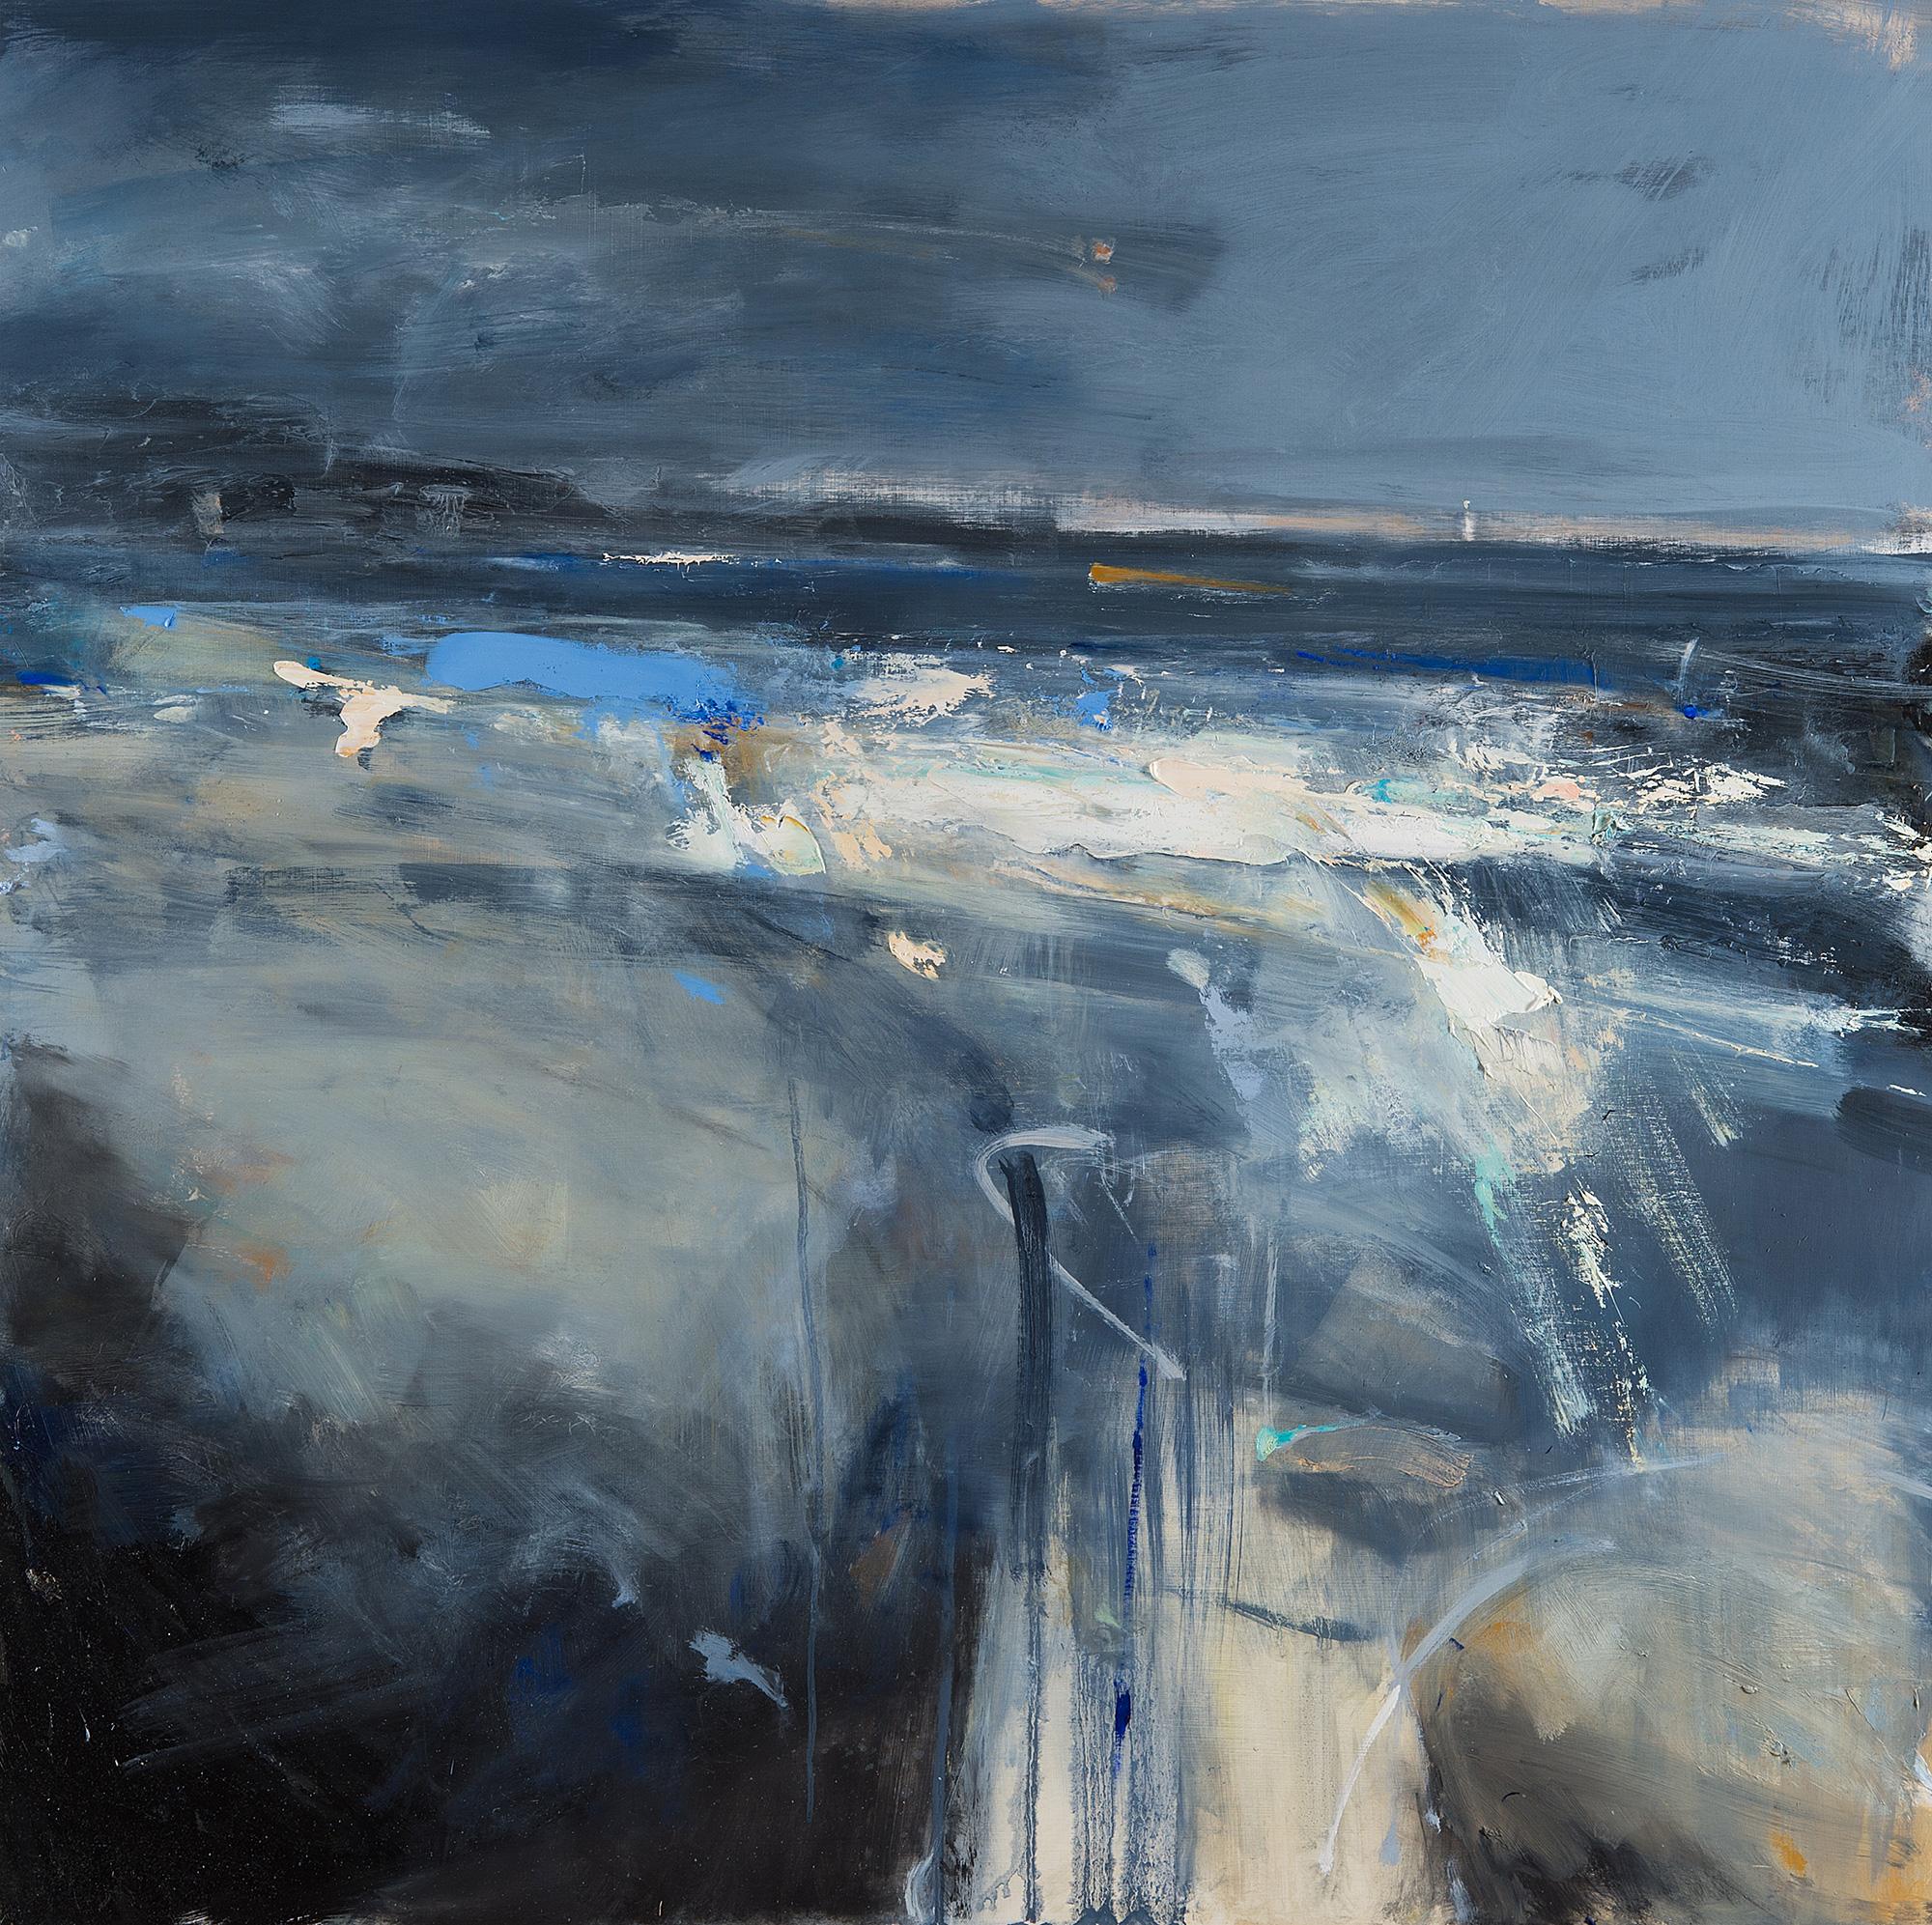 Evening Blue,Sennen Cove.  Oil on board.100 x 100cm  Sold